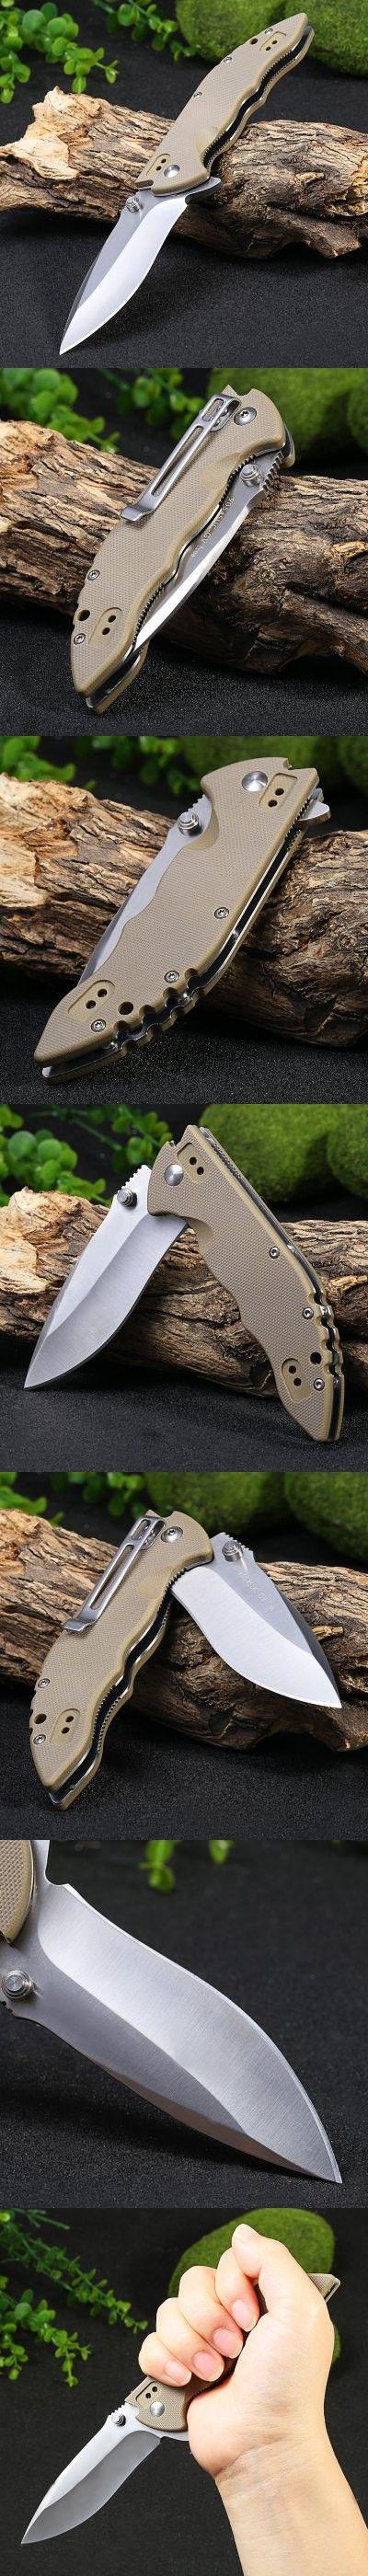 Pocket Knives and Folding Knives   Sanrenmu 9054 SUC-GV 58HRC Folding Knife